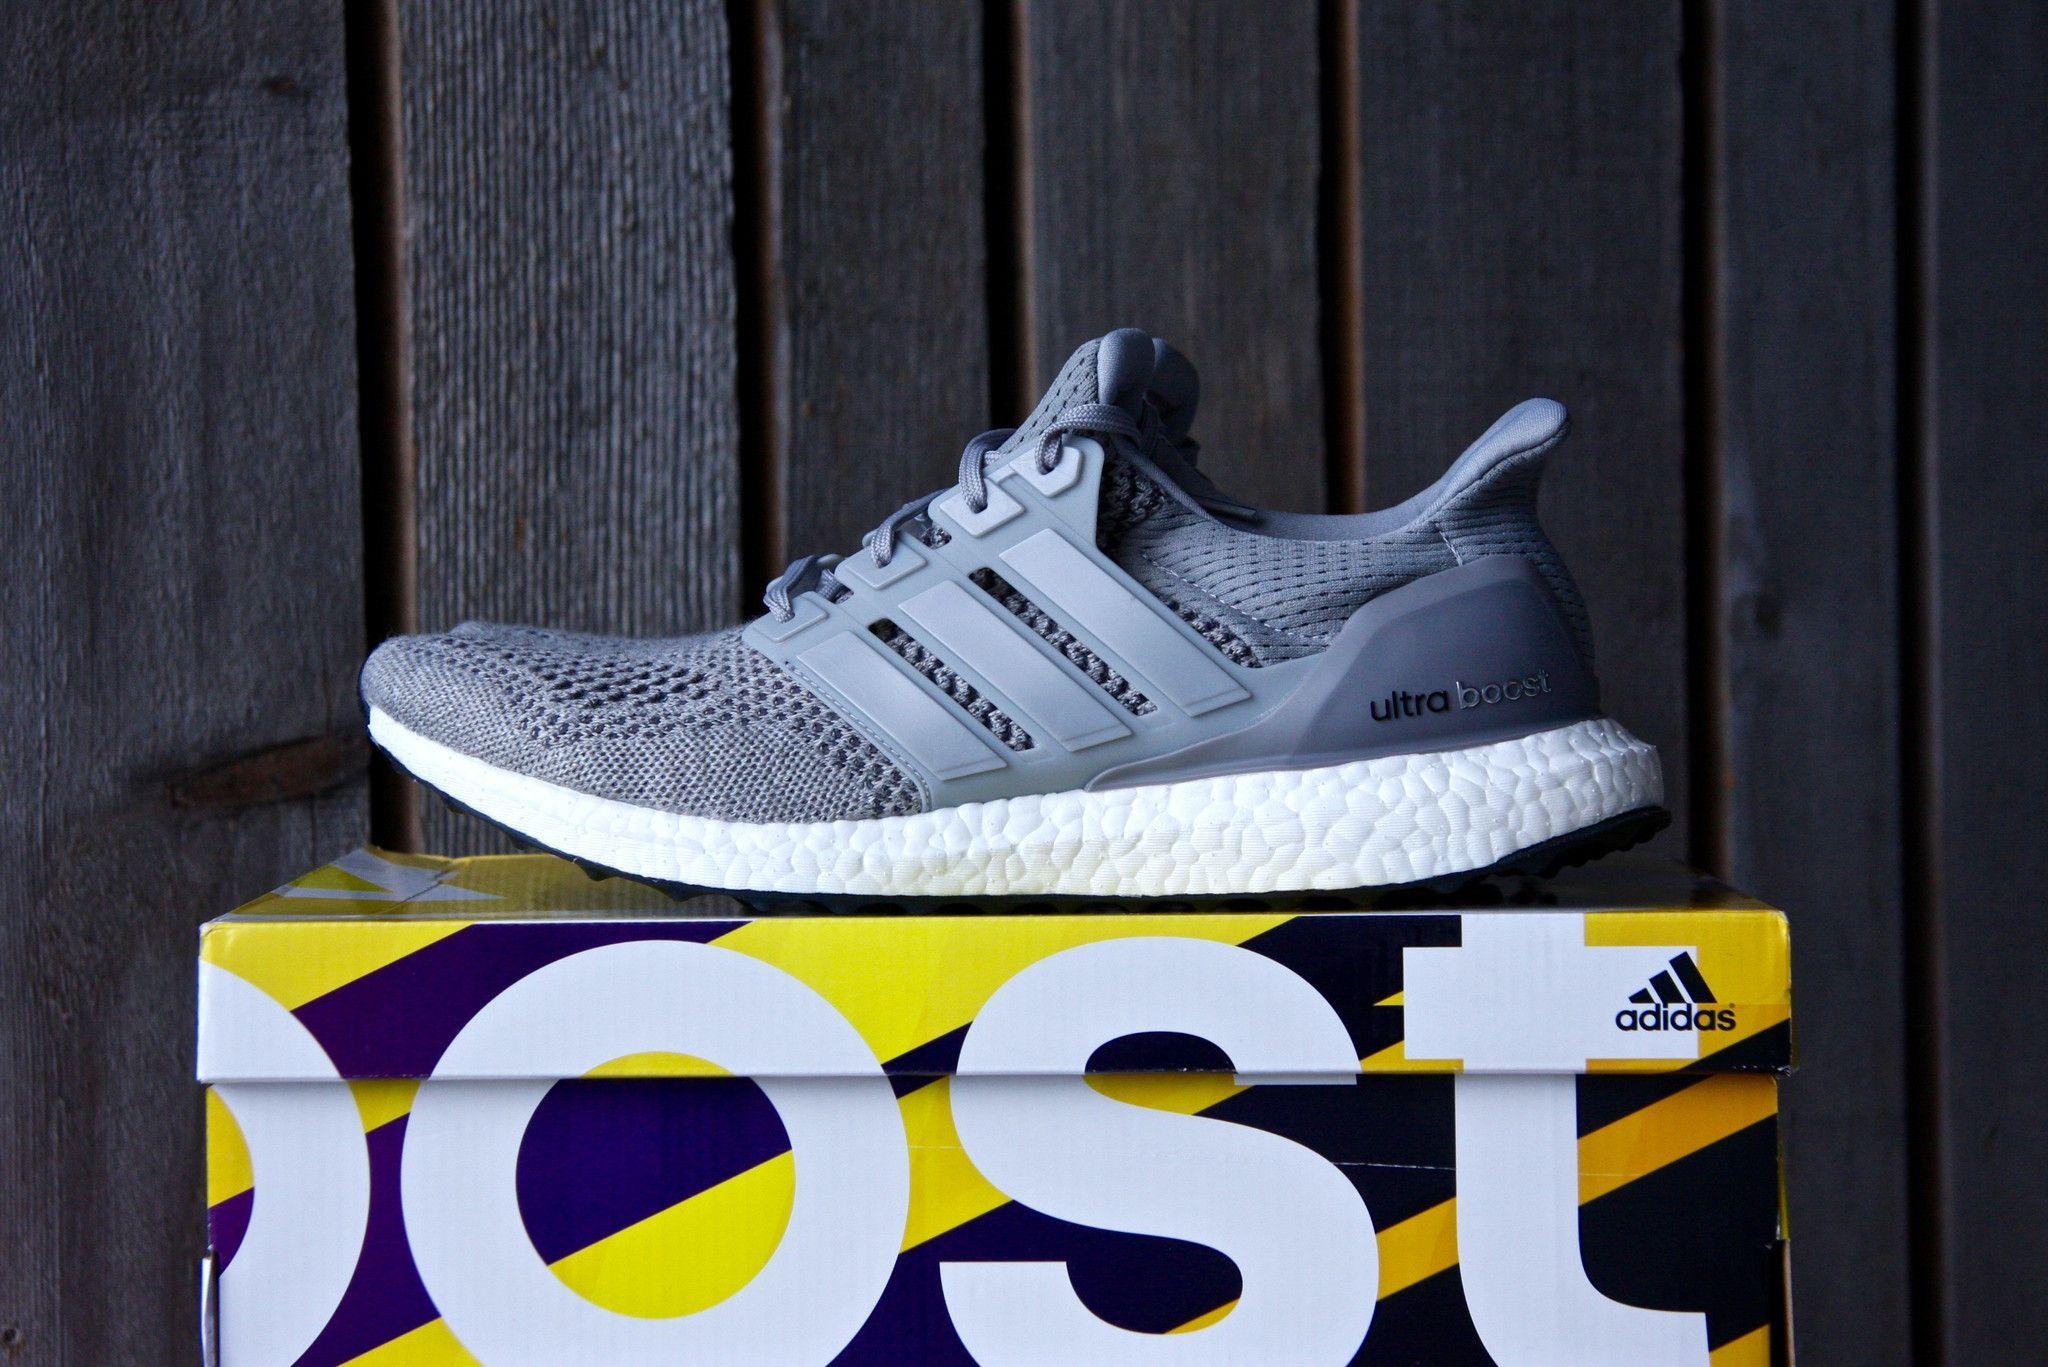 9b0bbb10786 Adidas Ultra Boost